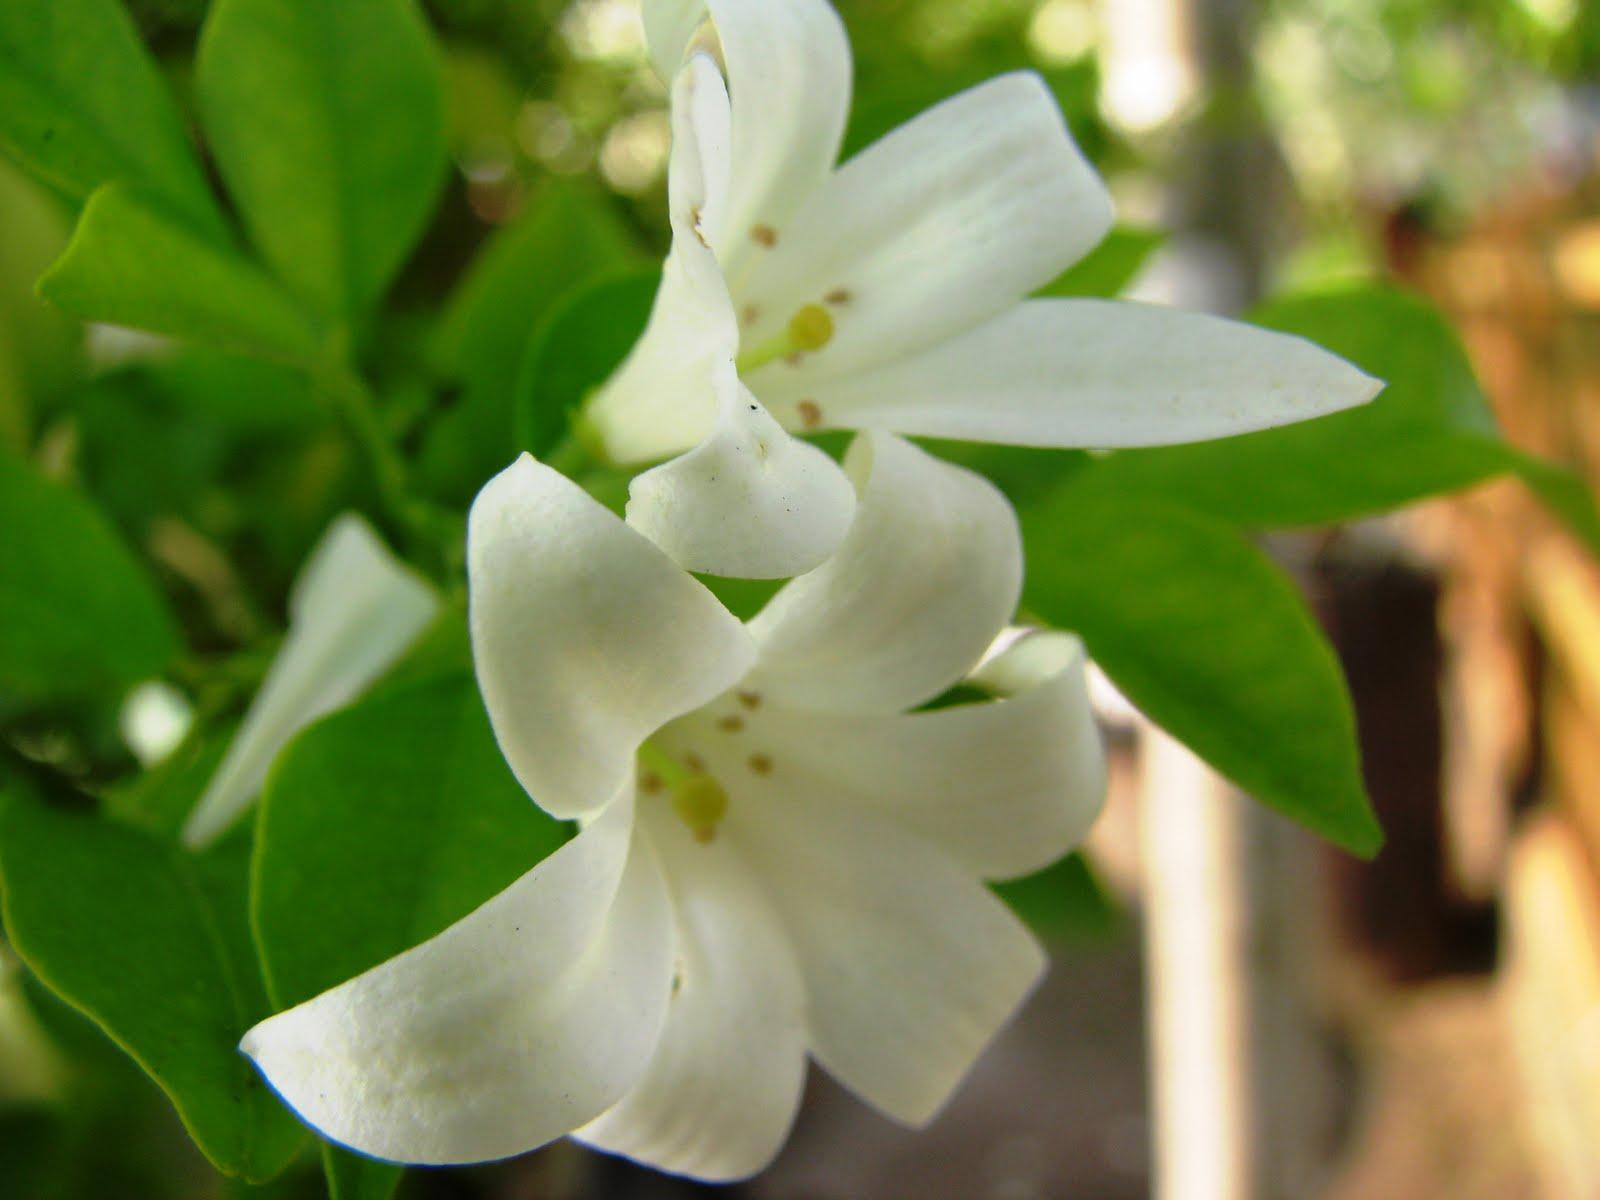 Yoyon Blog Berapa Nama Bunga Yang Anda Kenal 32 Jenis Bunga Dan